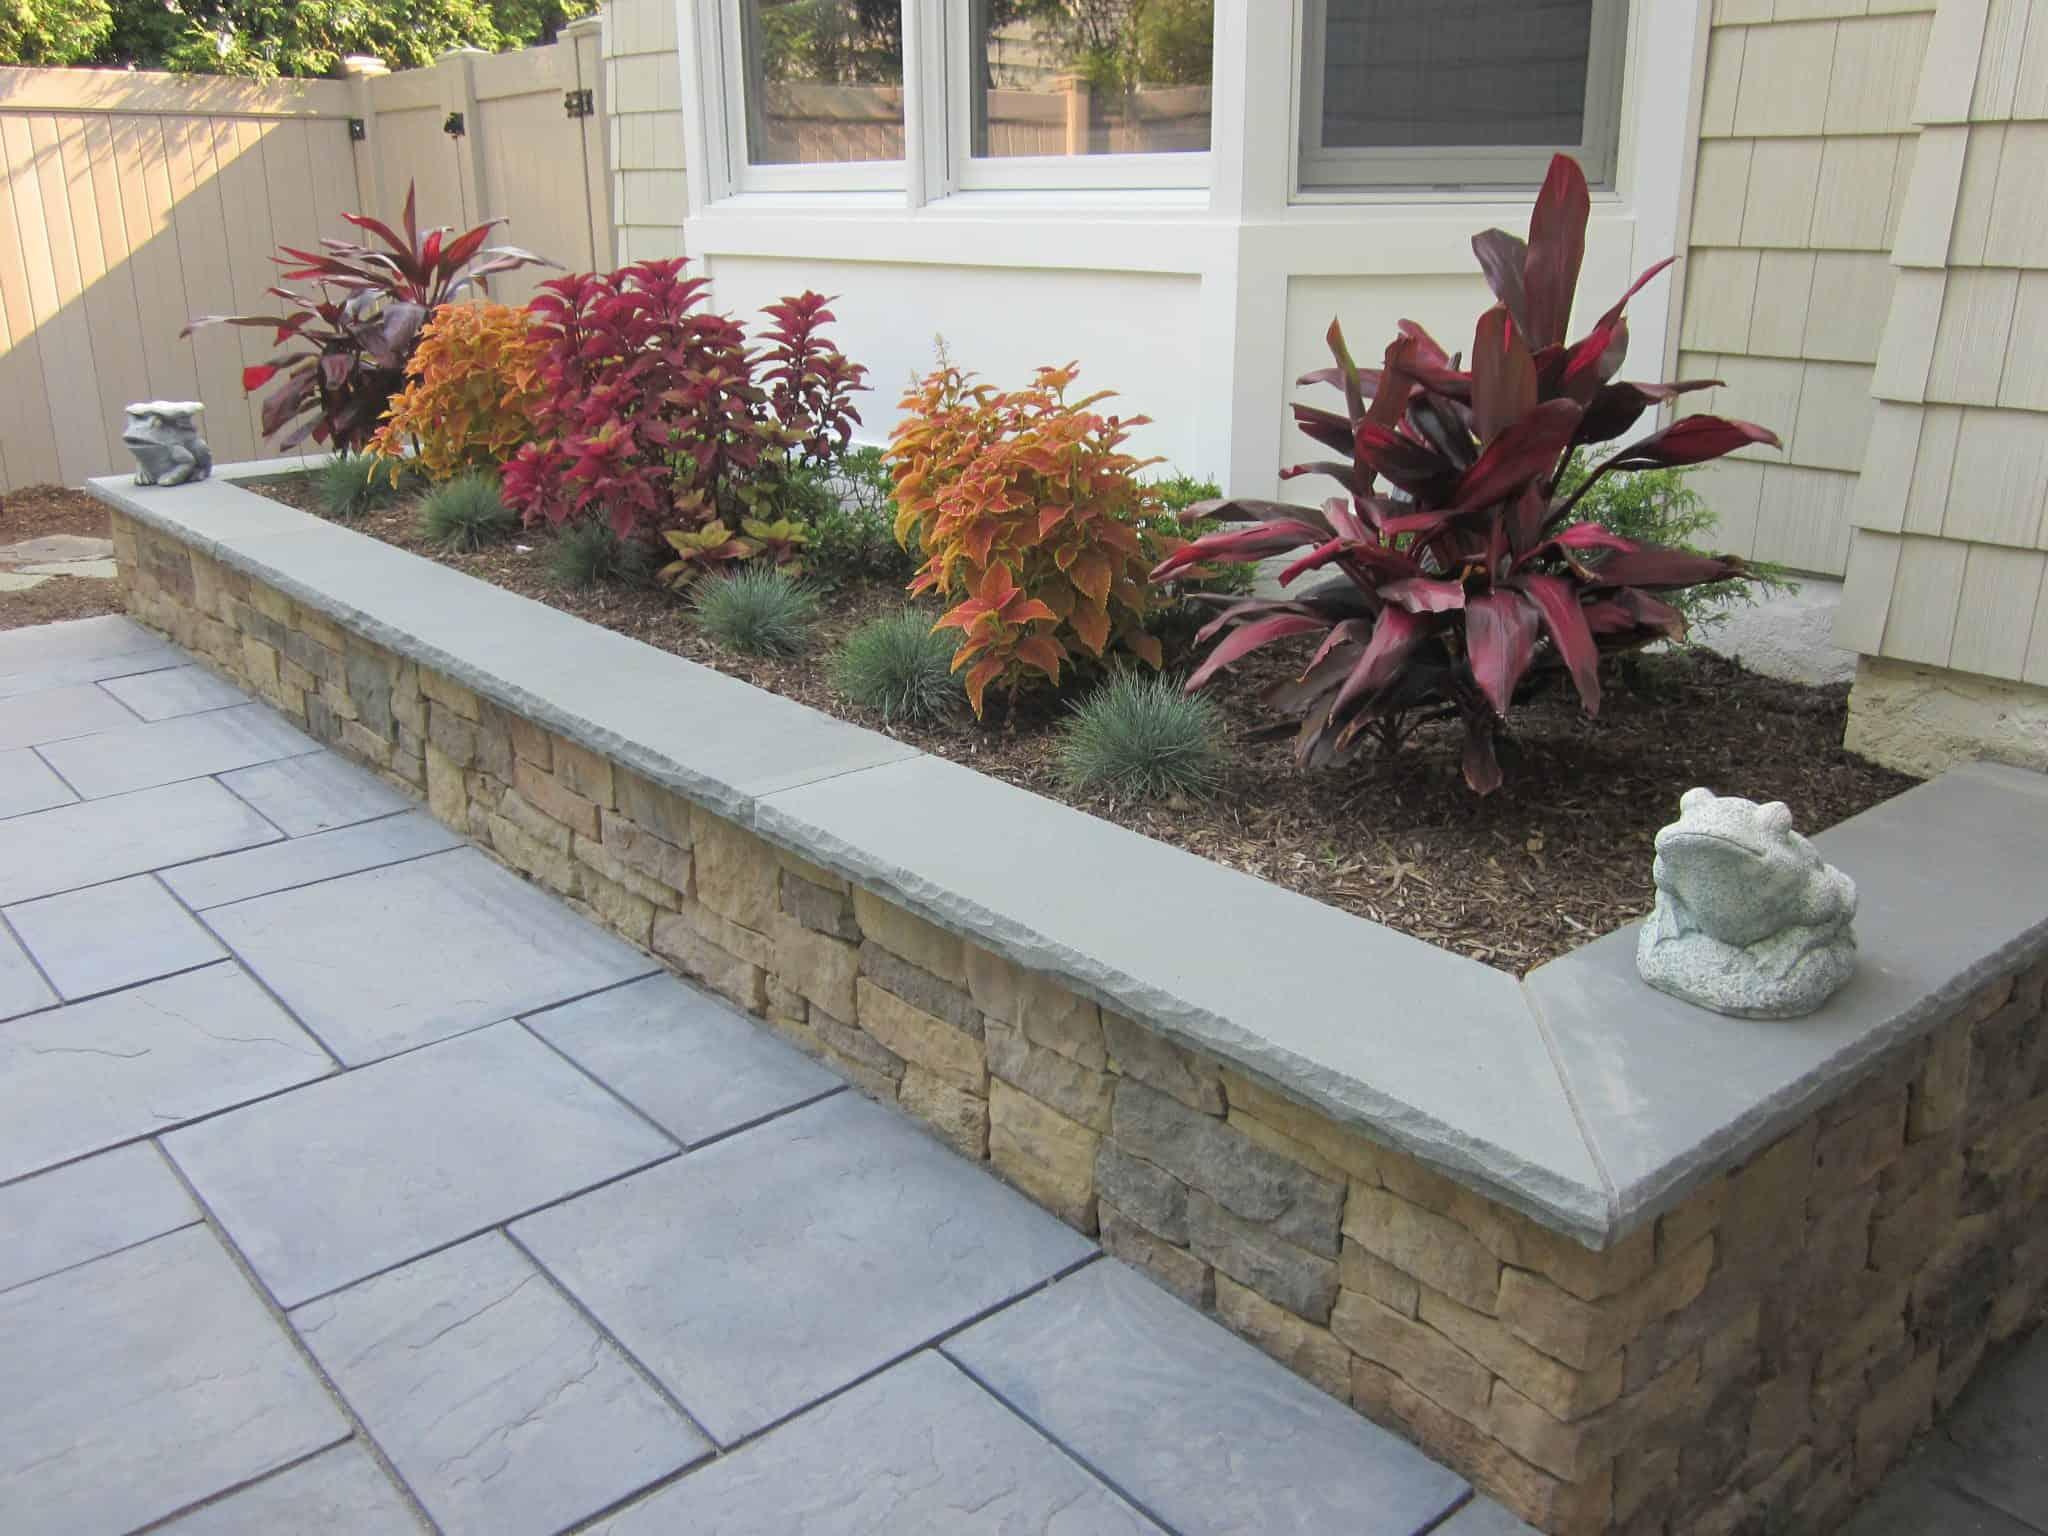 Custom Planter Box veneered with Cambridge - Canyon Ledge - Chestnut - with Rock Faced Bluestone treads - Merrick, Long Island NY